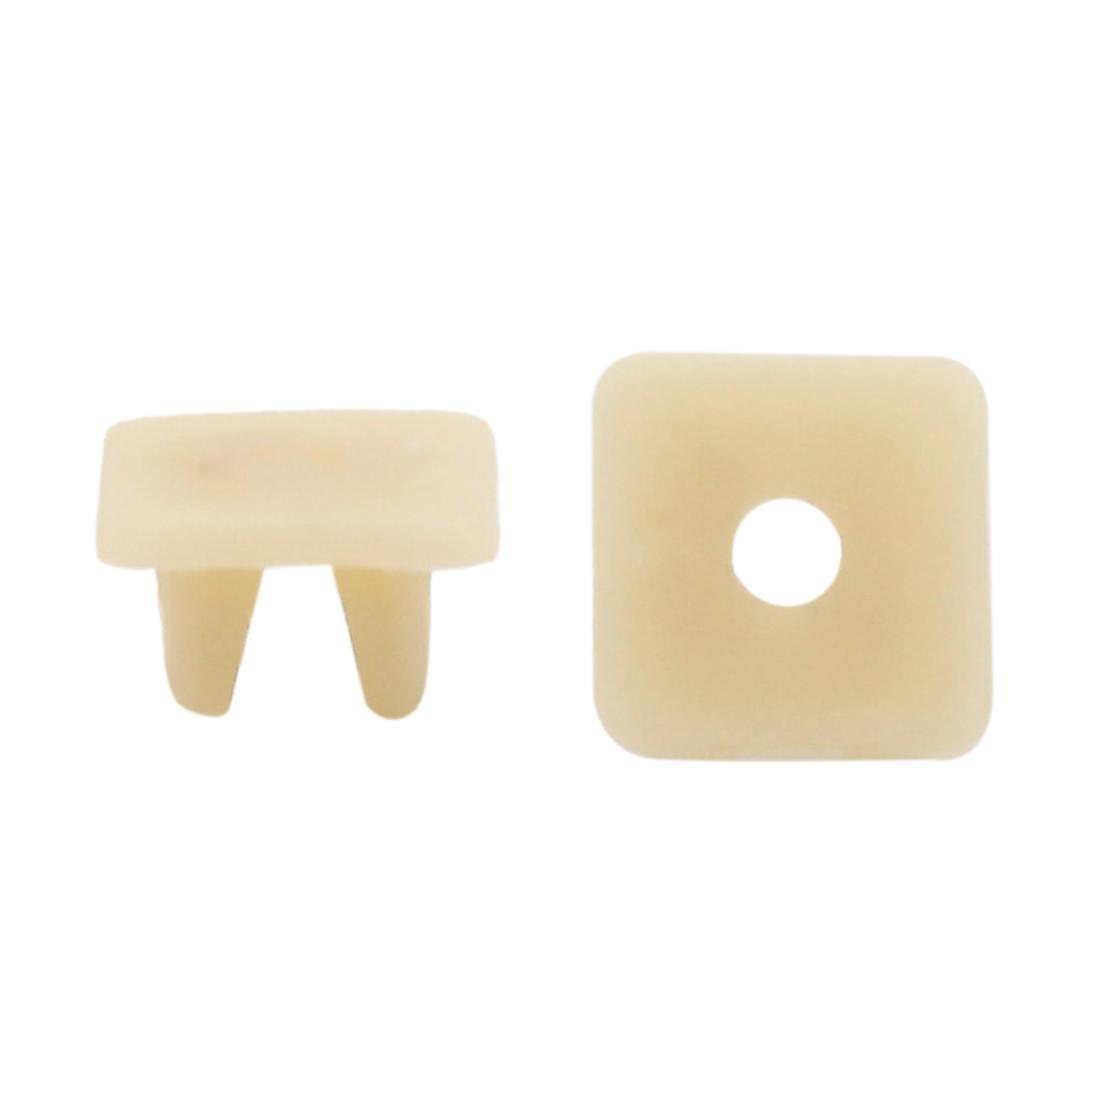 20pcs 9 x 8mm Hole Beige Plastic Rivets Fastener Push Clips for Car Auto Fender